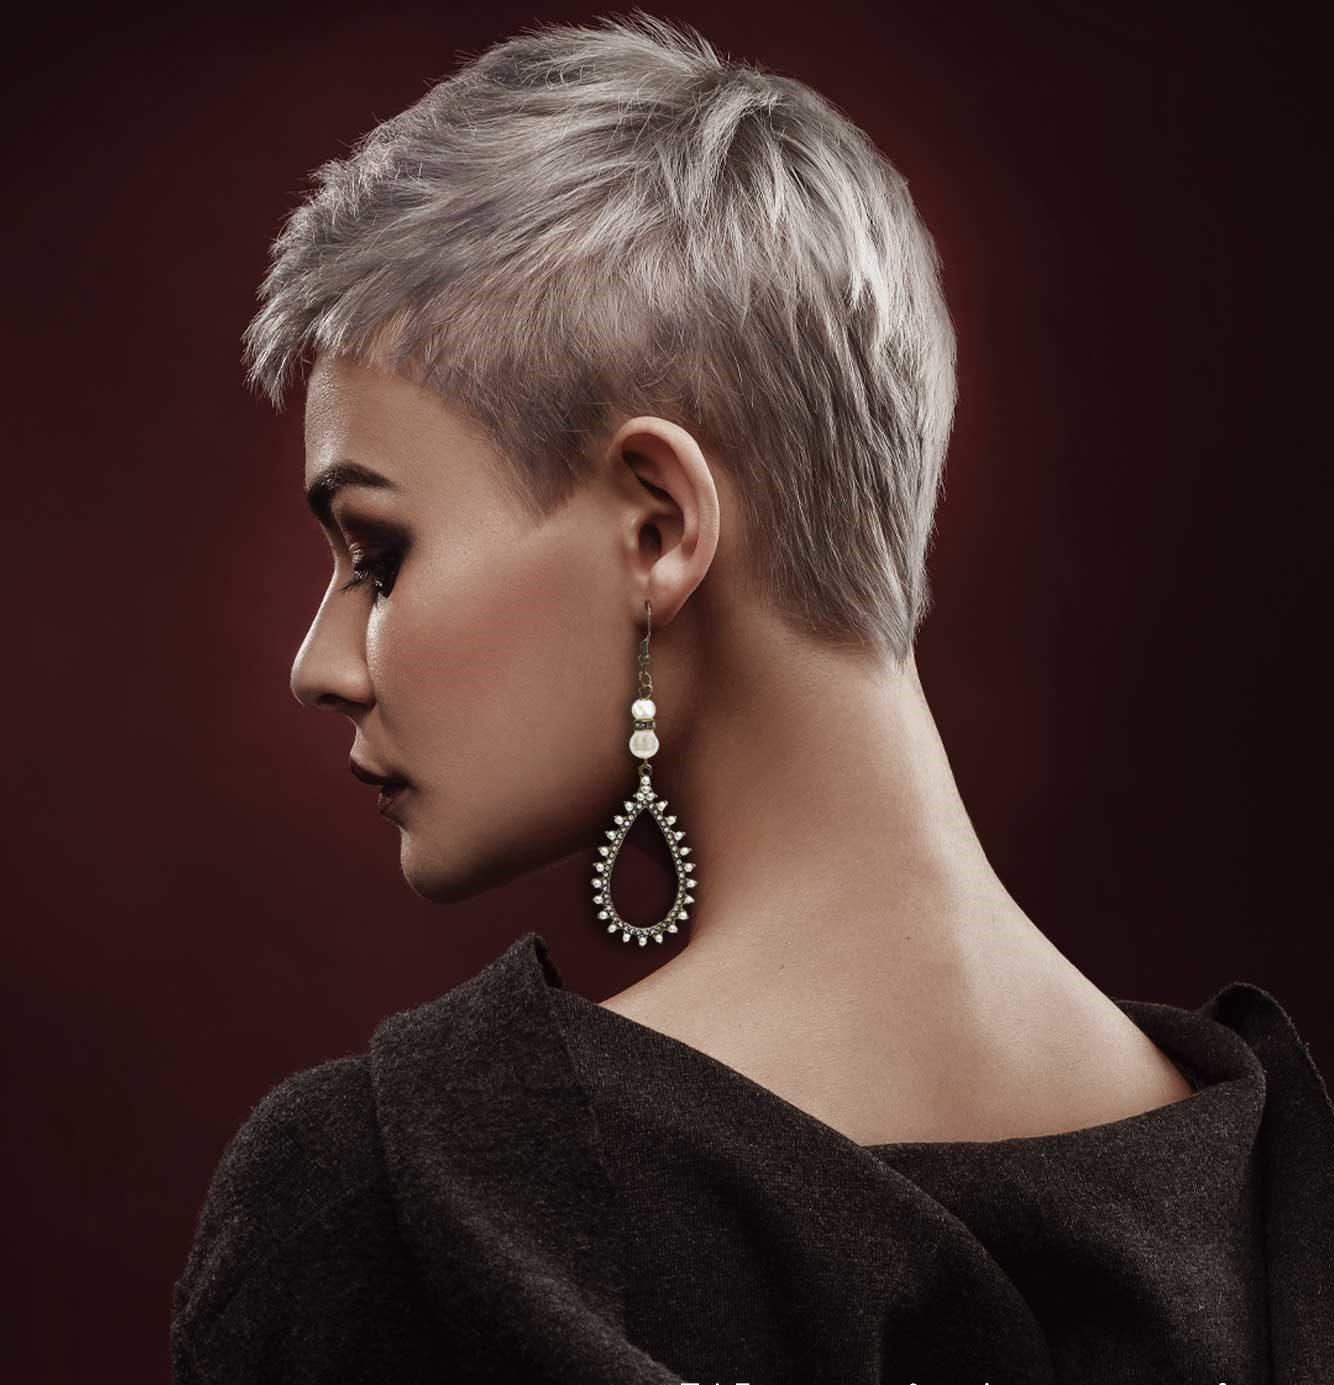 White Woman wearing classy earrings in a black top on burgundy background. Dlaen's Jewelry p